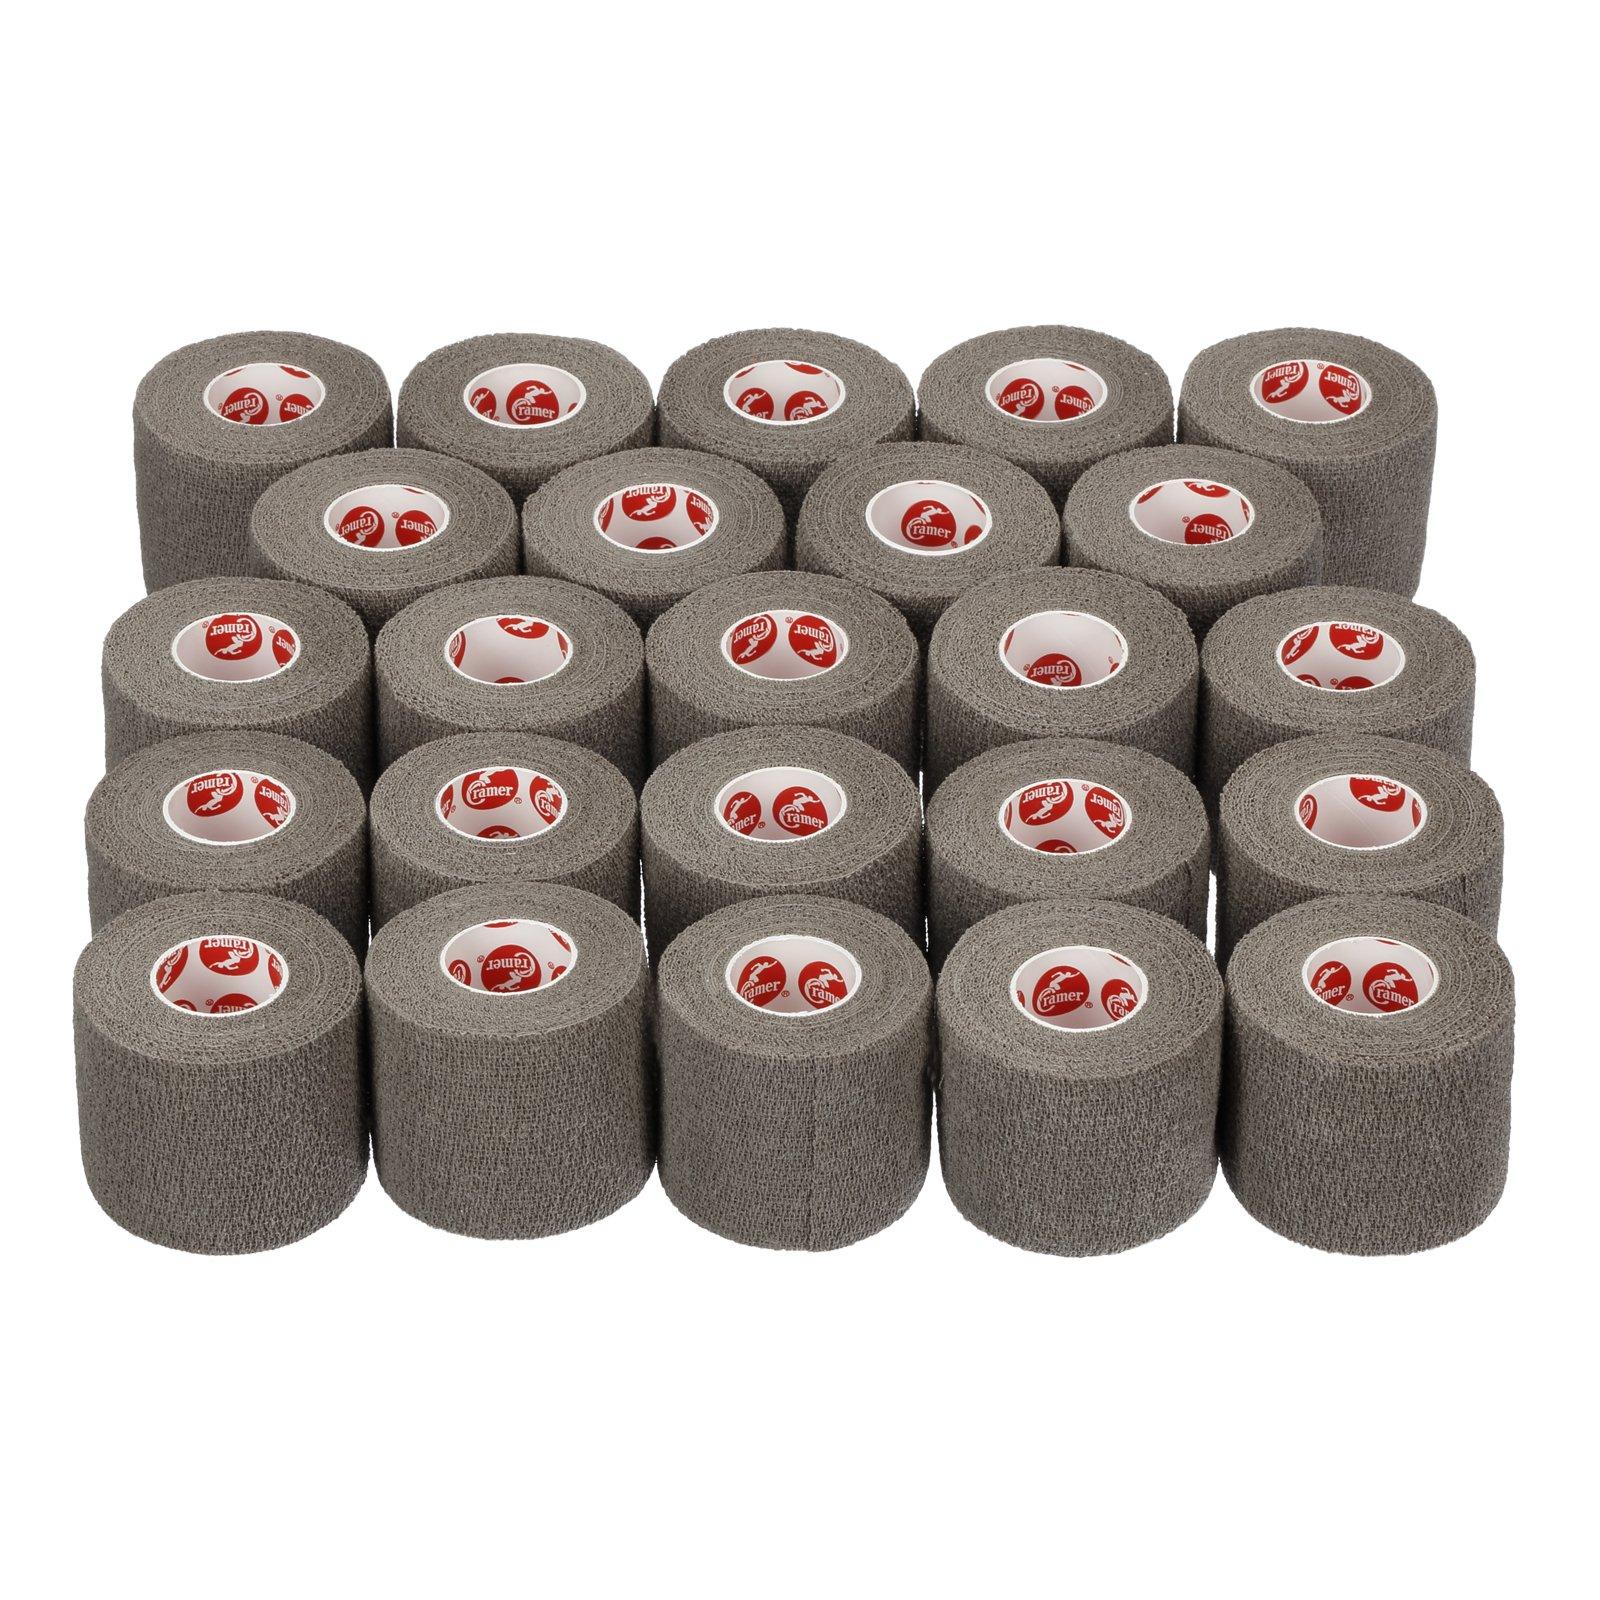 Cramer Eco-Flex Self-Stick Stretch Tape, Cohesive Tape, Flexible Elastic Sports Tape, Athletic Training Supplies, Easy Tear Self-Adherent Bandage Wrap, Bulk Cases, 2'' X 5'' Yard Rolls, Compression Tape